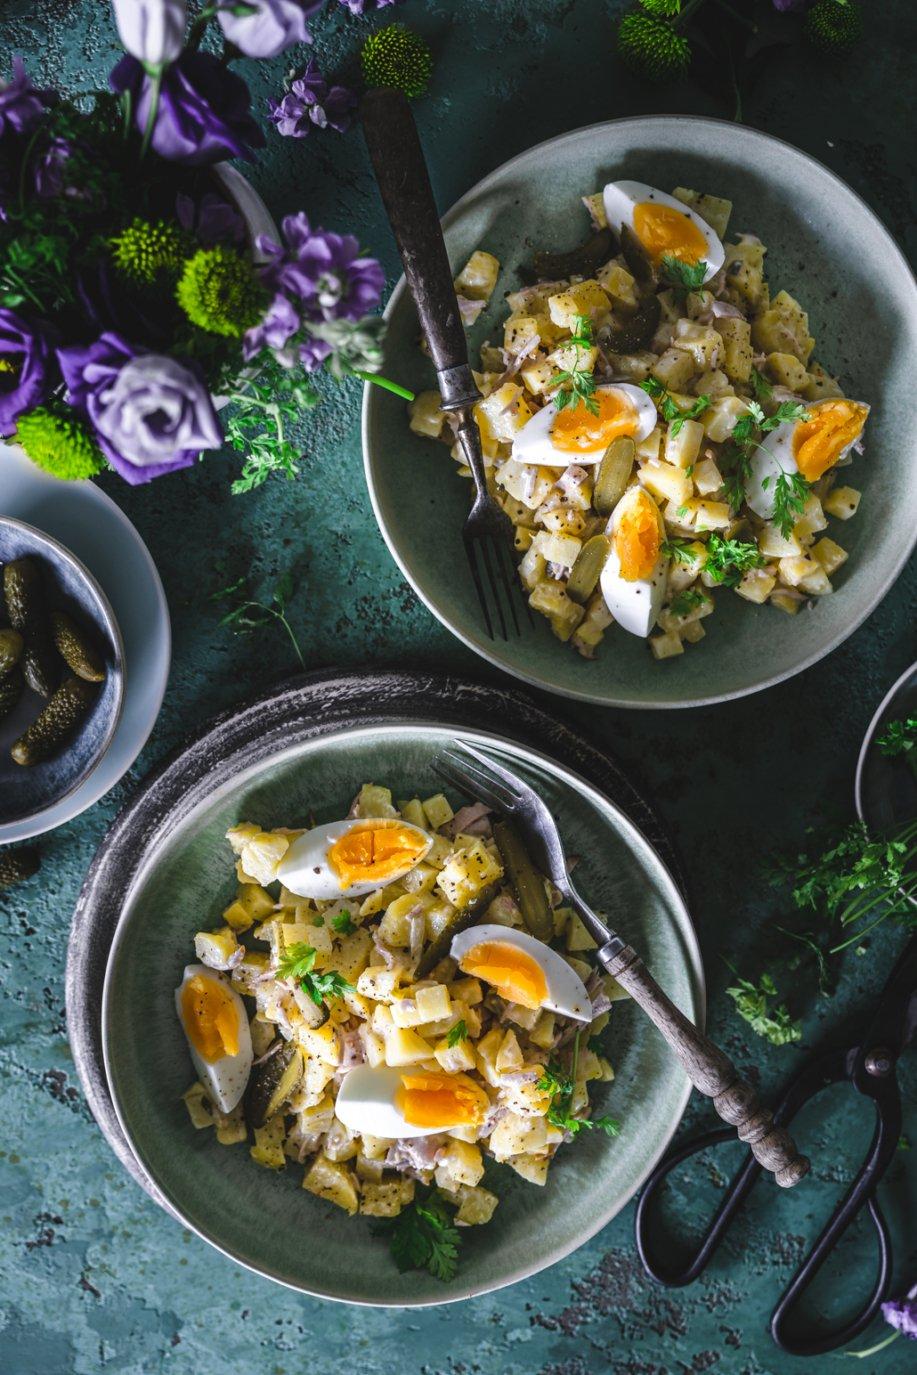 Omis Kartoffelsalat